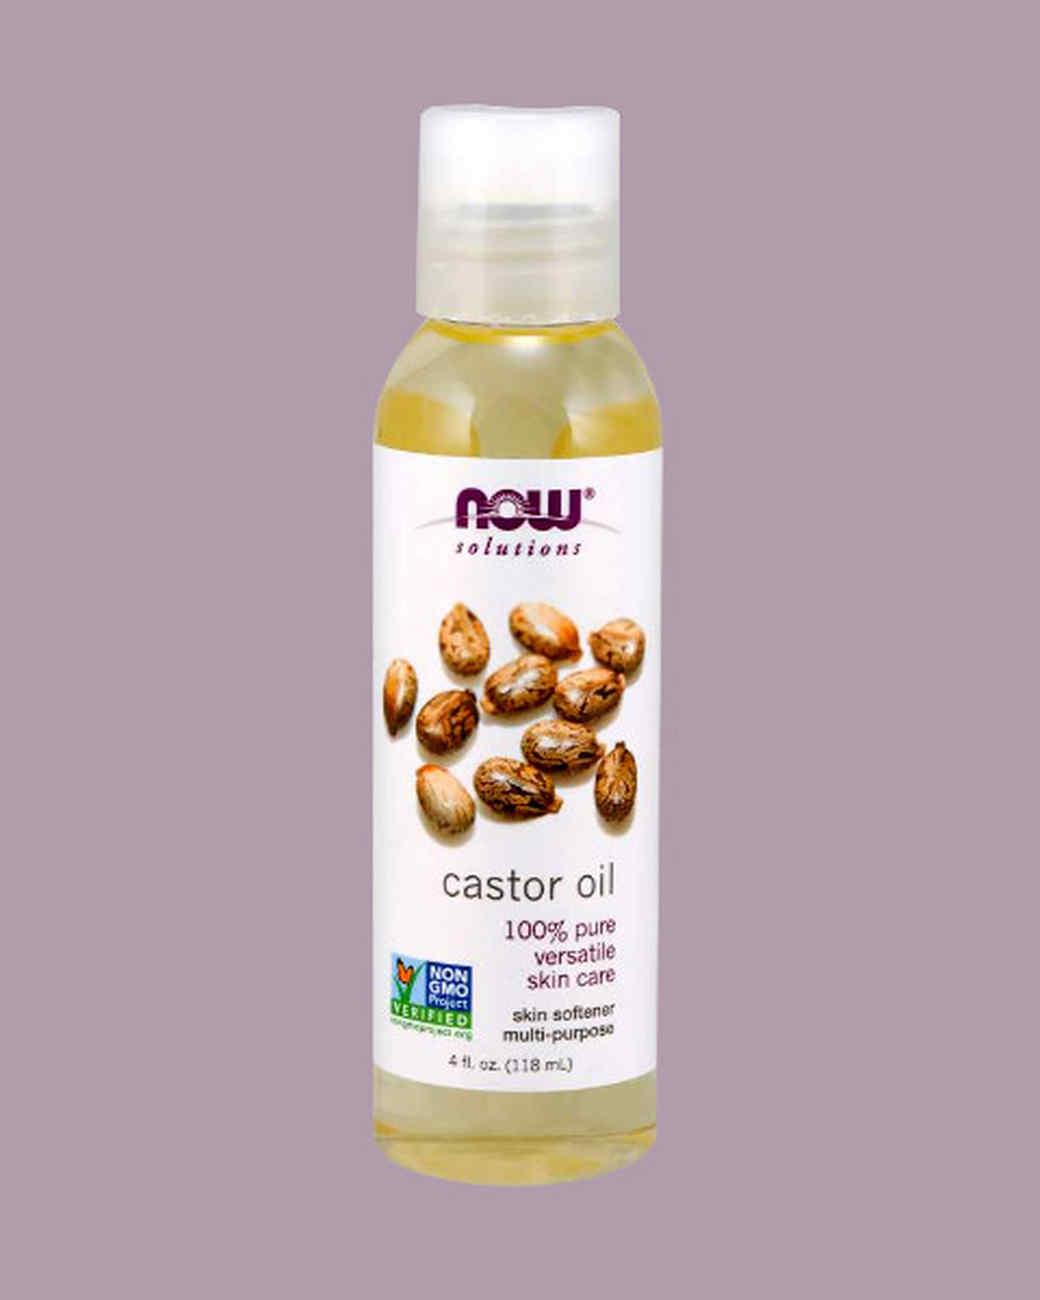 NOW Solutions Castor Oil